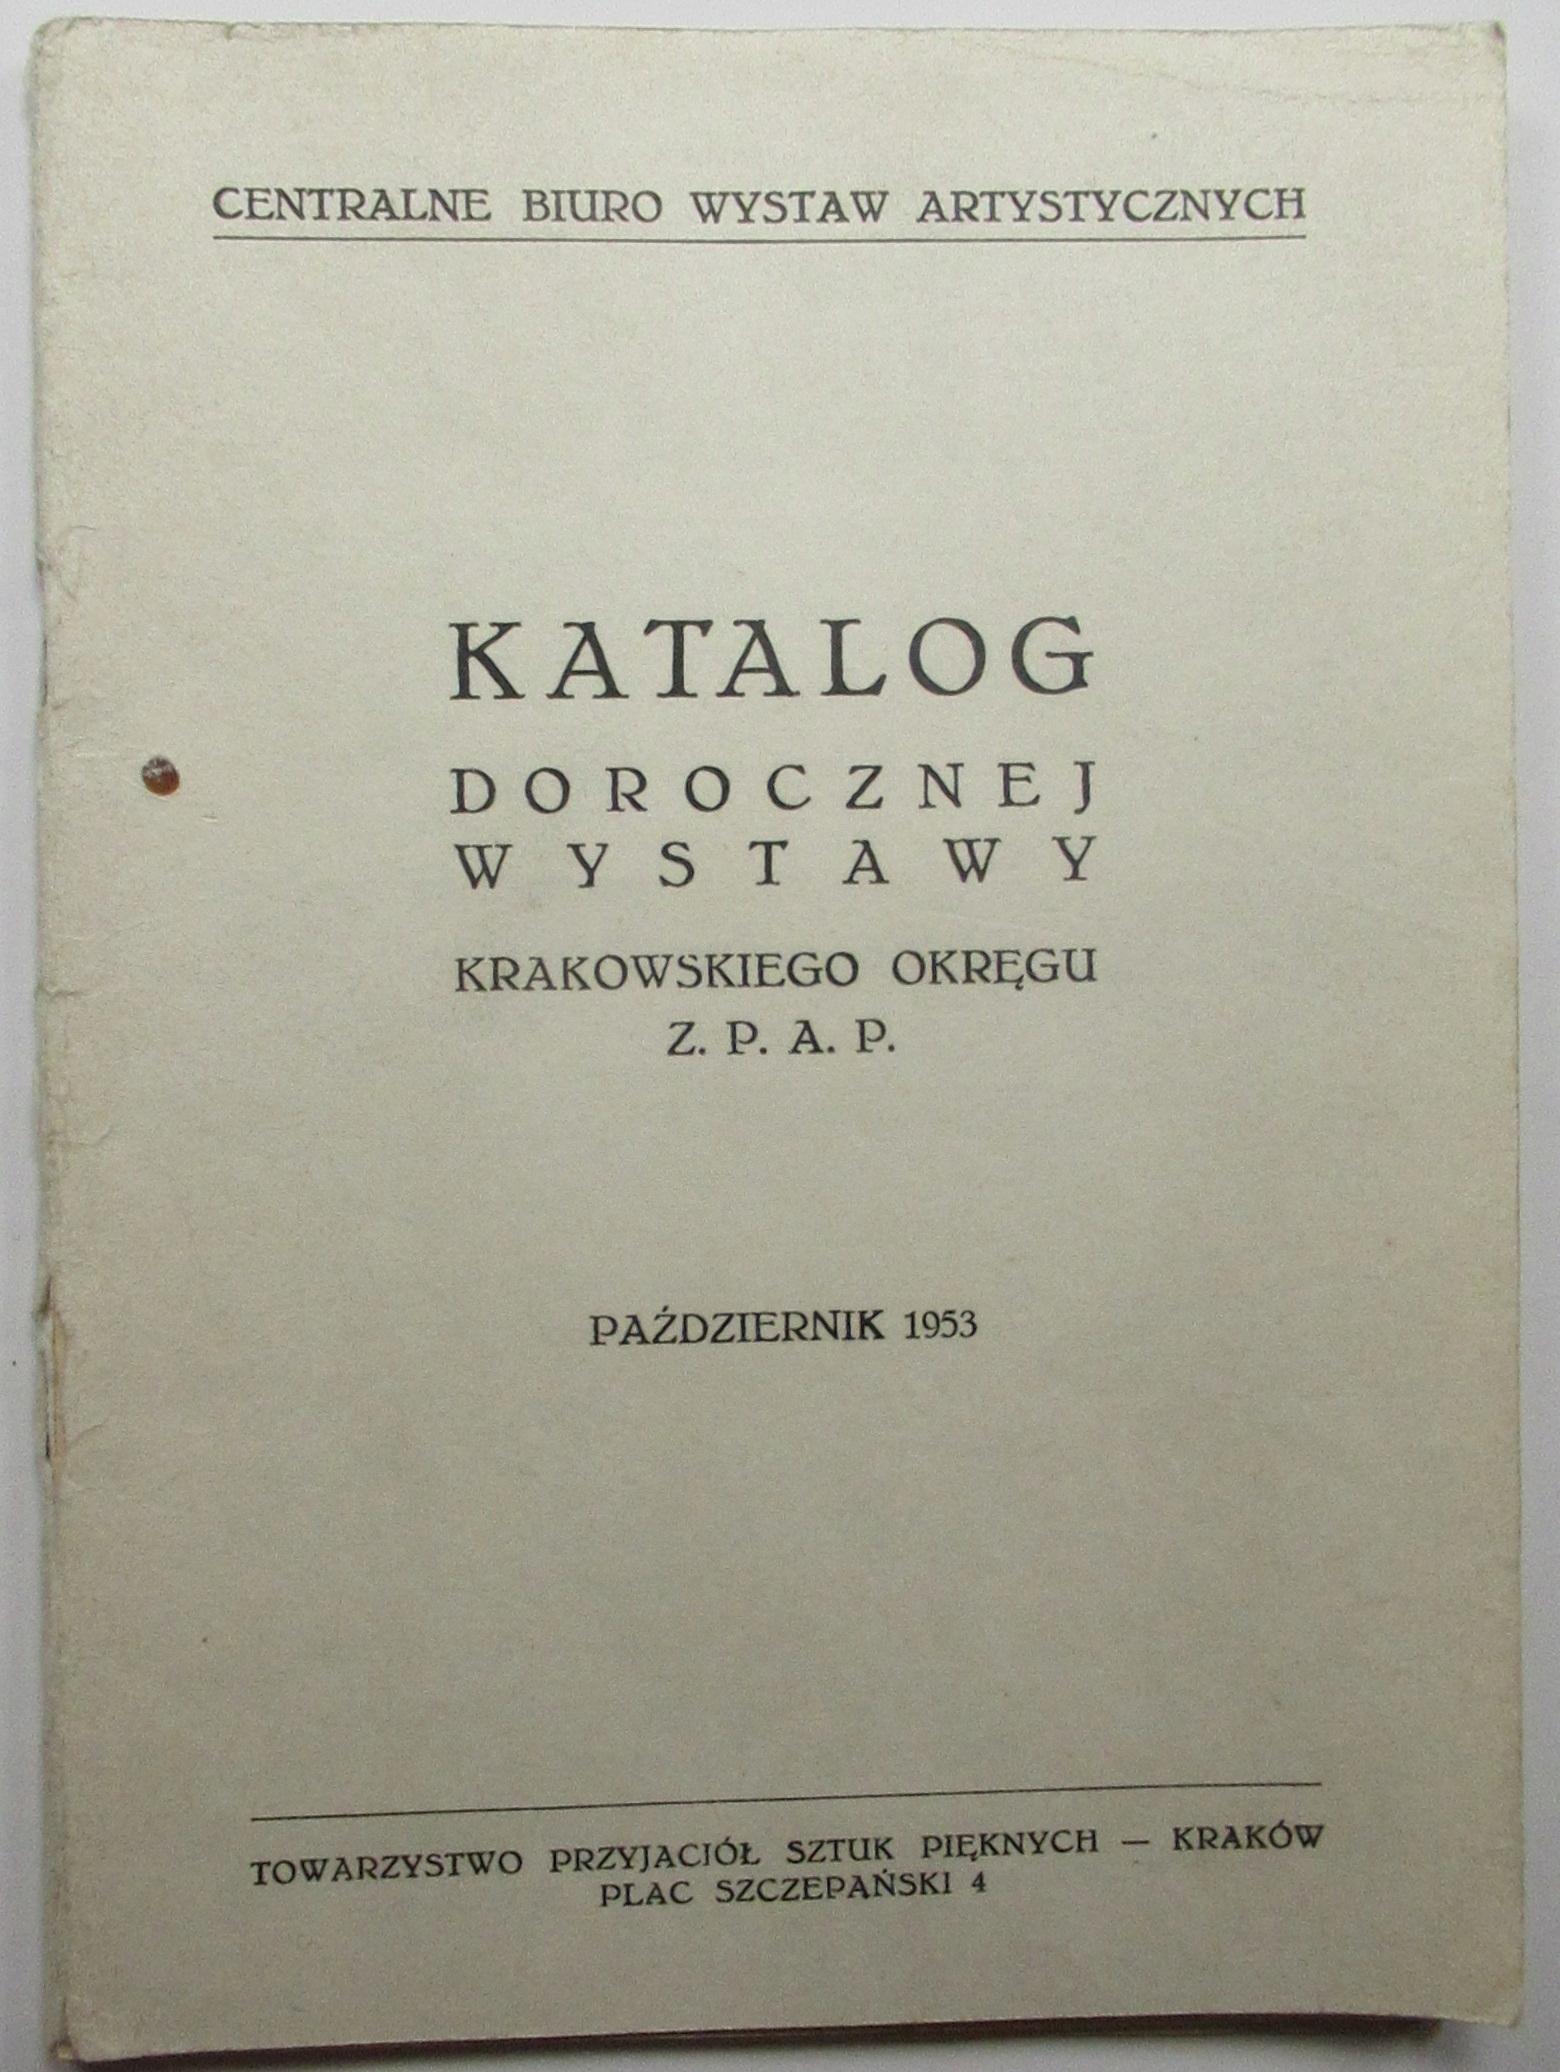 Каталог, ВЫСТАВКА ZPAP, Краков 1953, СОКРЕАЛИЗМ